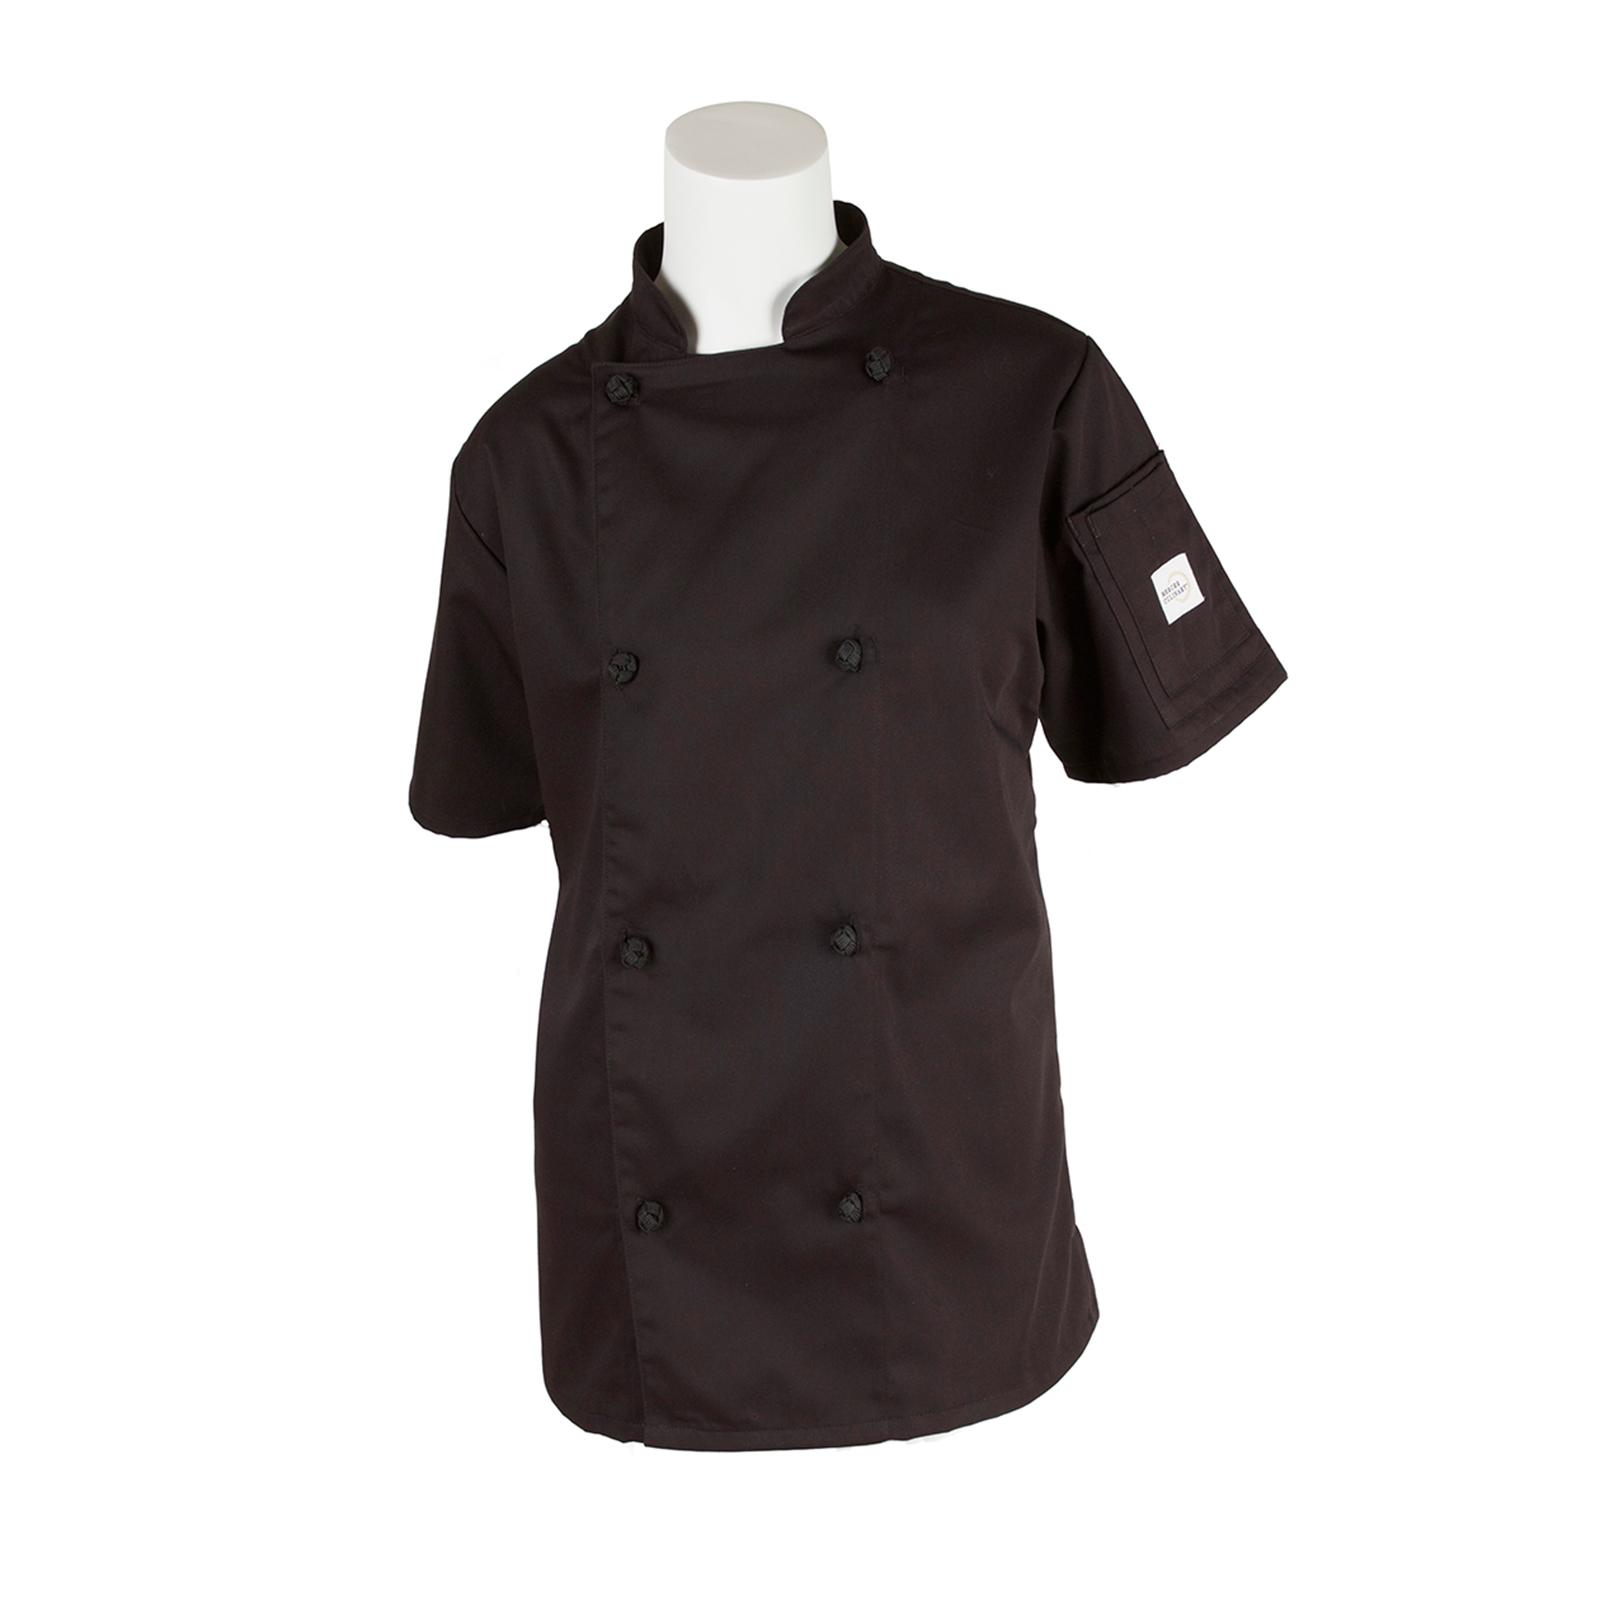 Mercer Culinary M61042BKM chef's coat